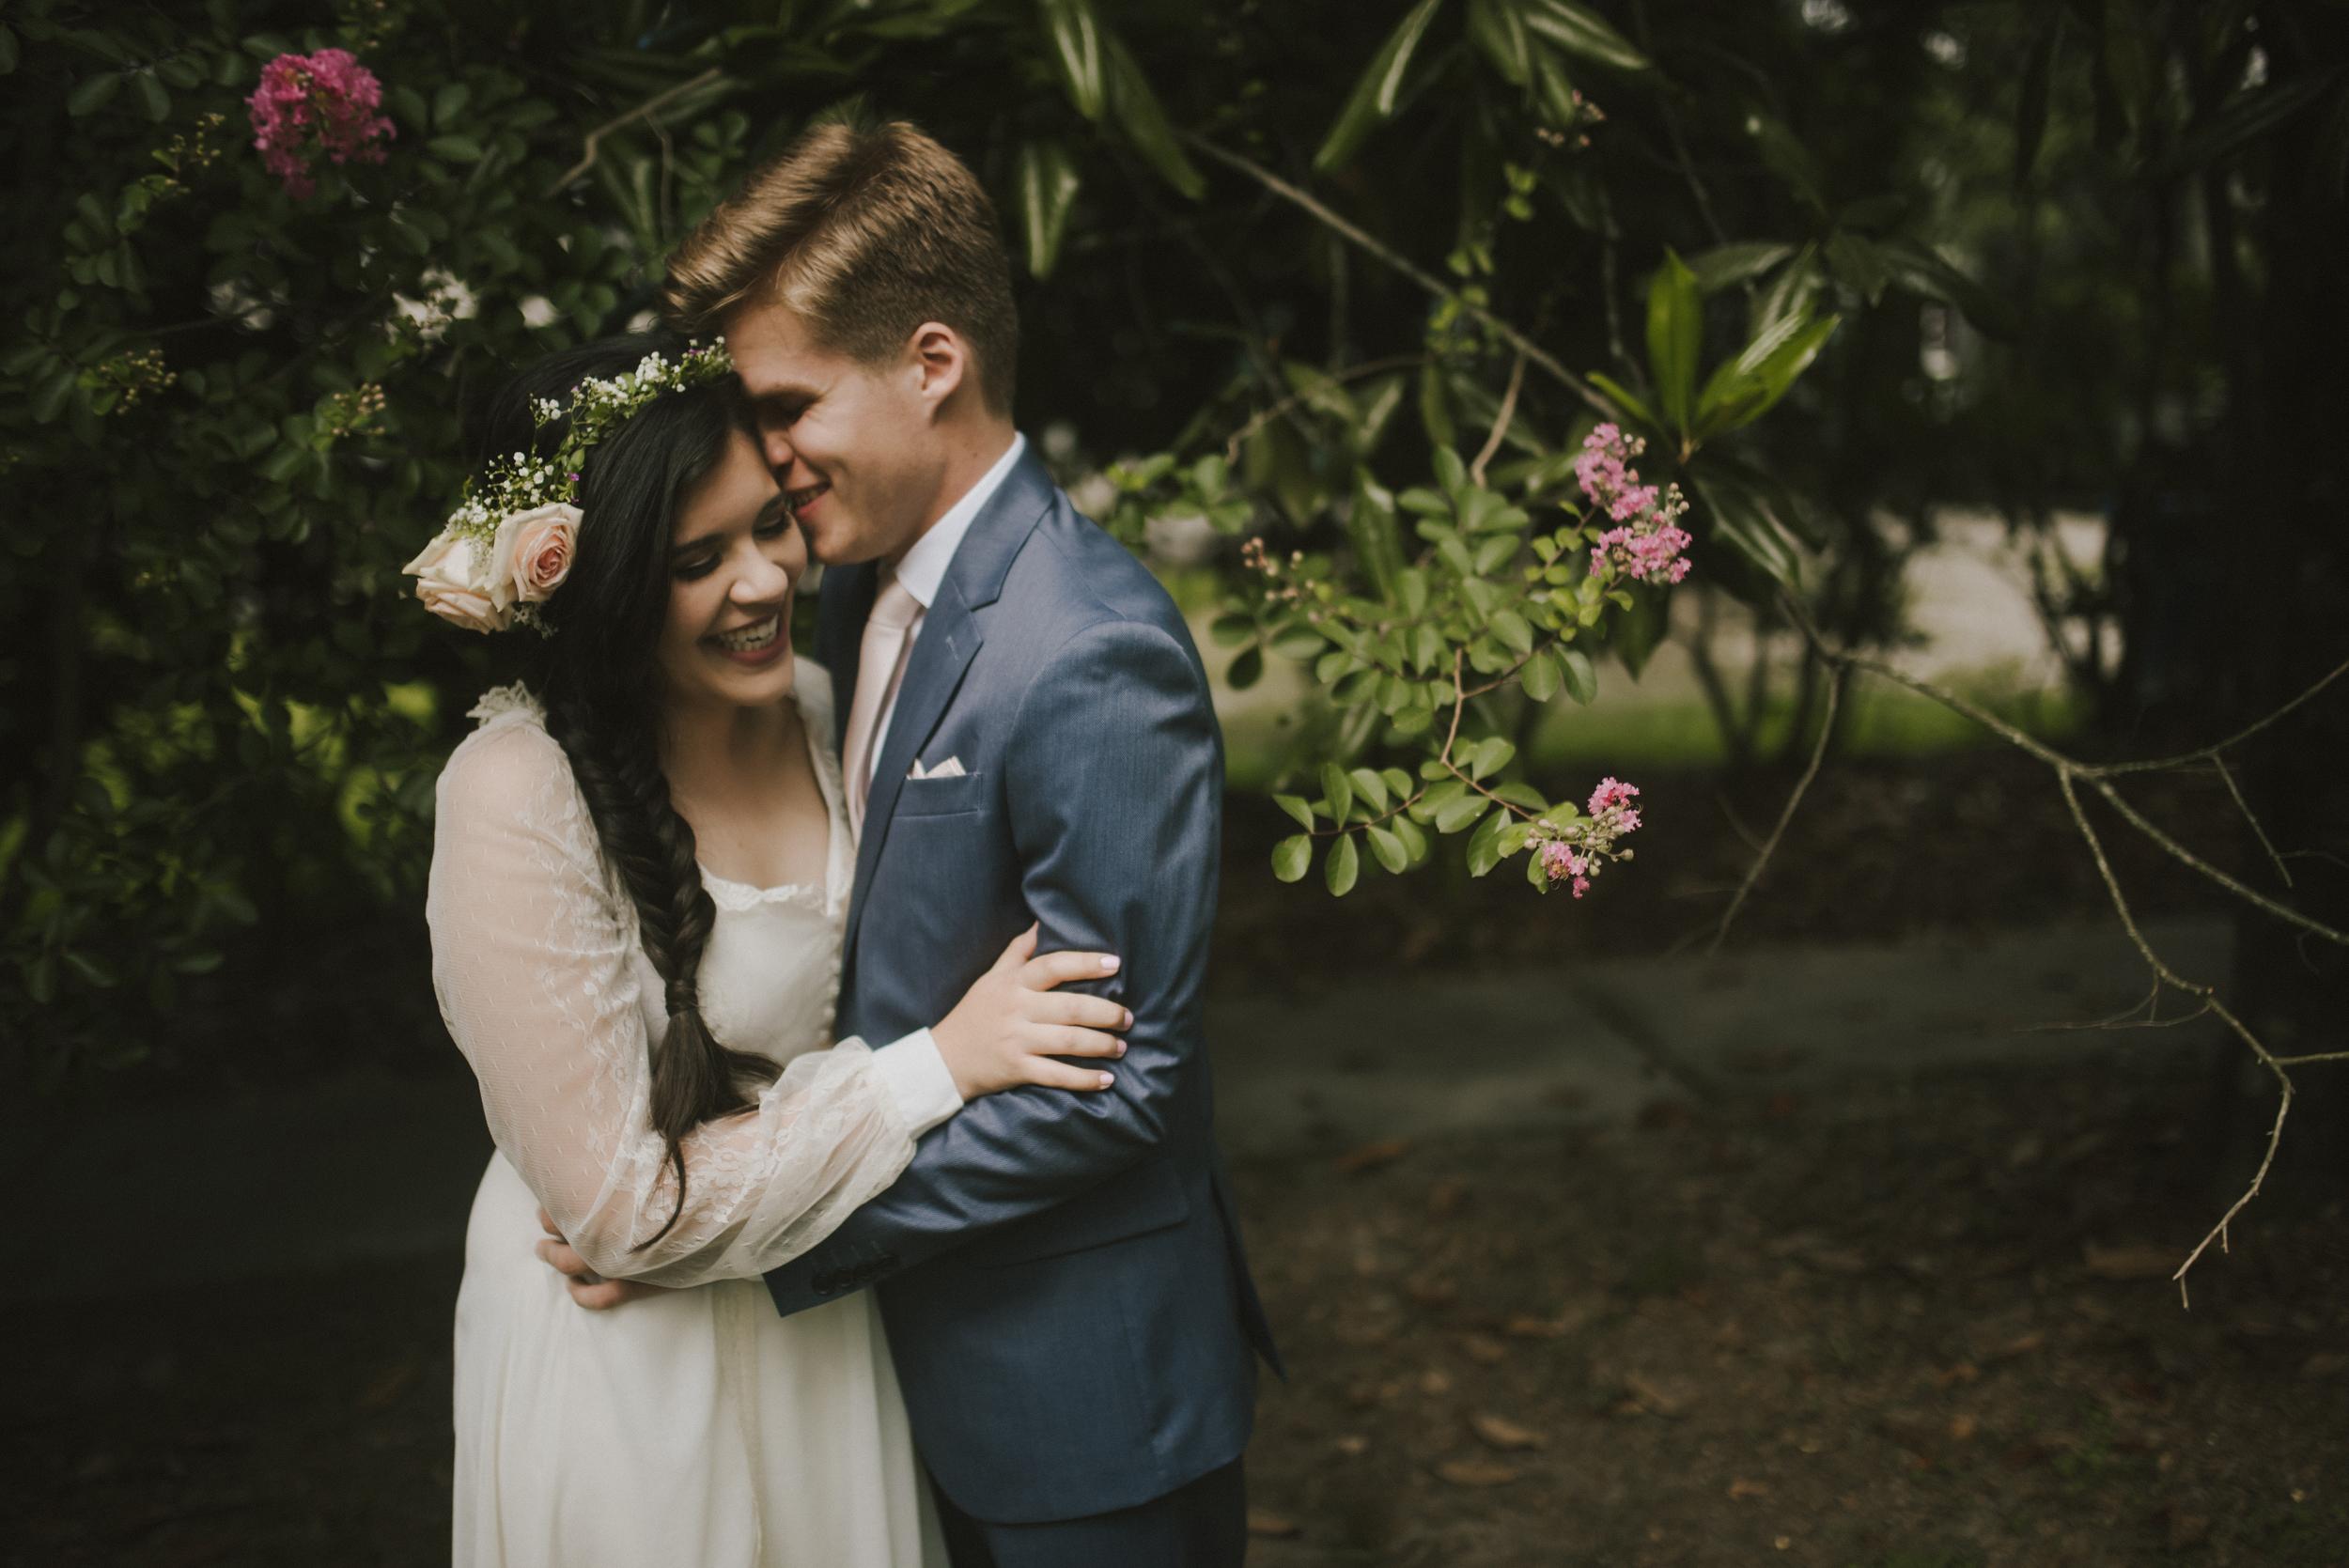 ofRen_weddingphotographer-84.jpg